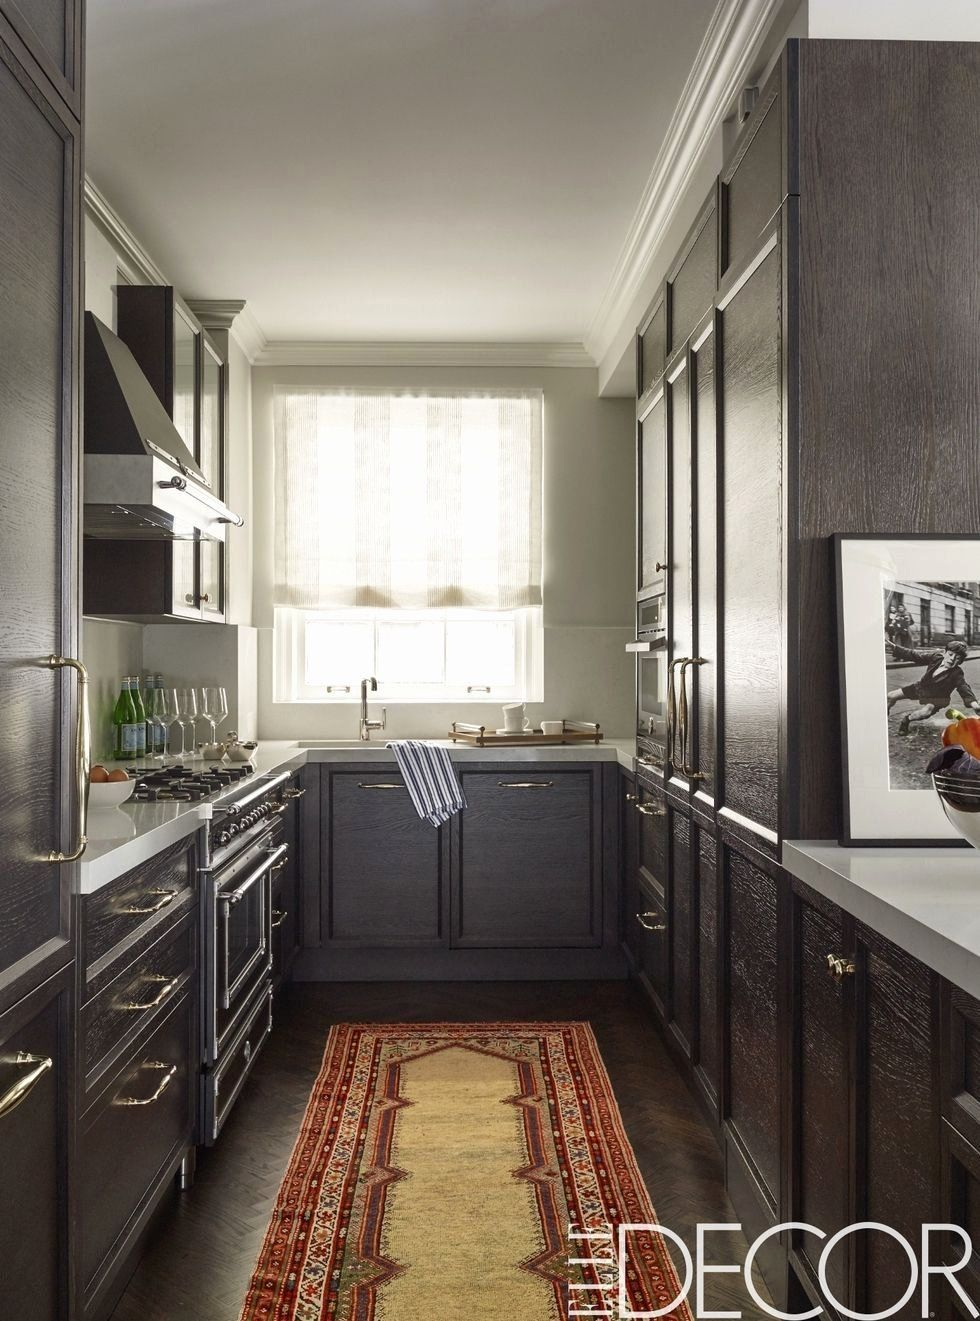 Best Small Kitchen Designs Awesome 60 Creative Small Kitchen Ideas Brilliant Small Spa In 2020 Simple Kitchen Design Kitchen Design Images Small Kitchen Cabinet Design